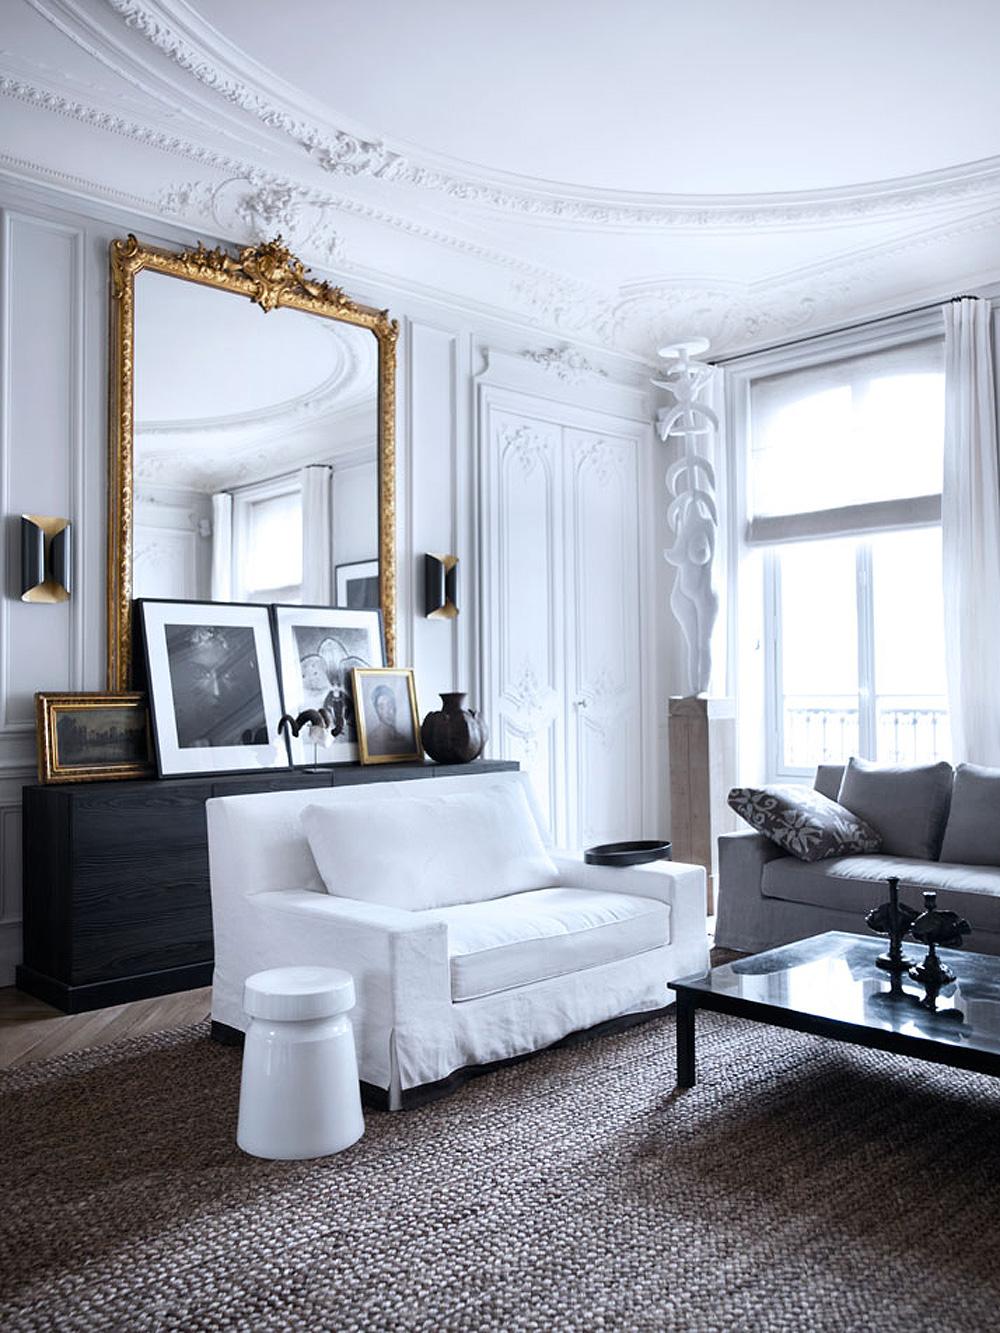 Paris-Apartment-Tour-Art-1.jpg